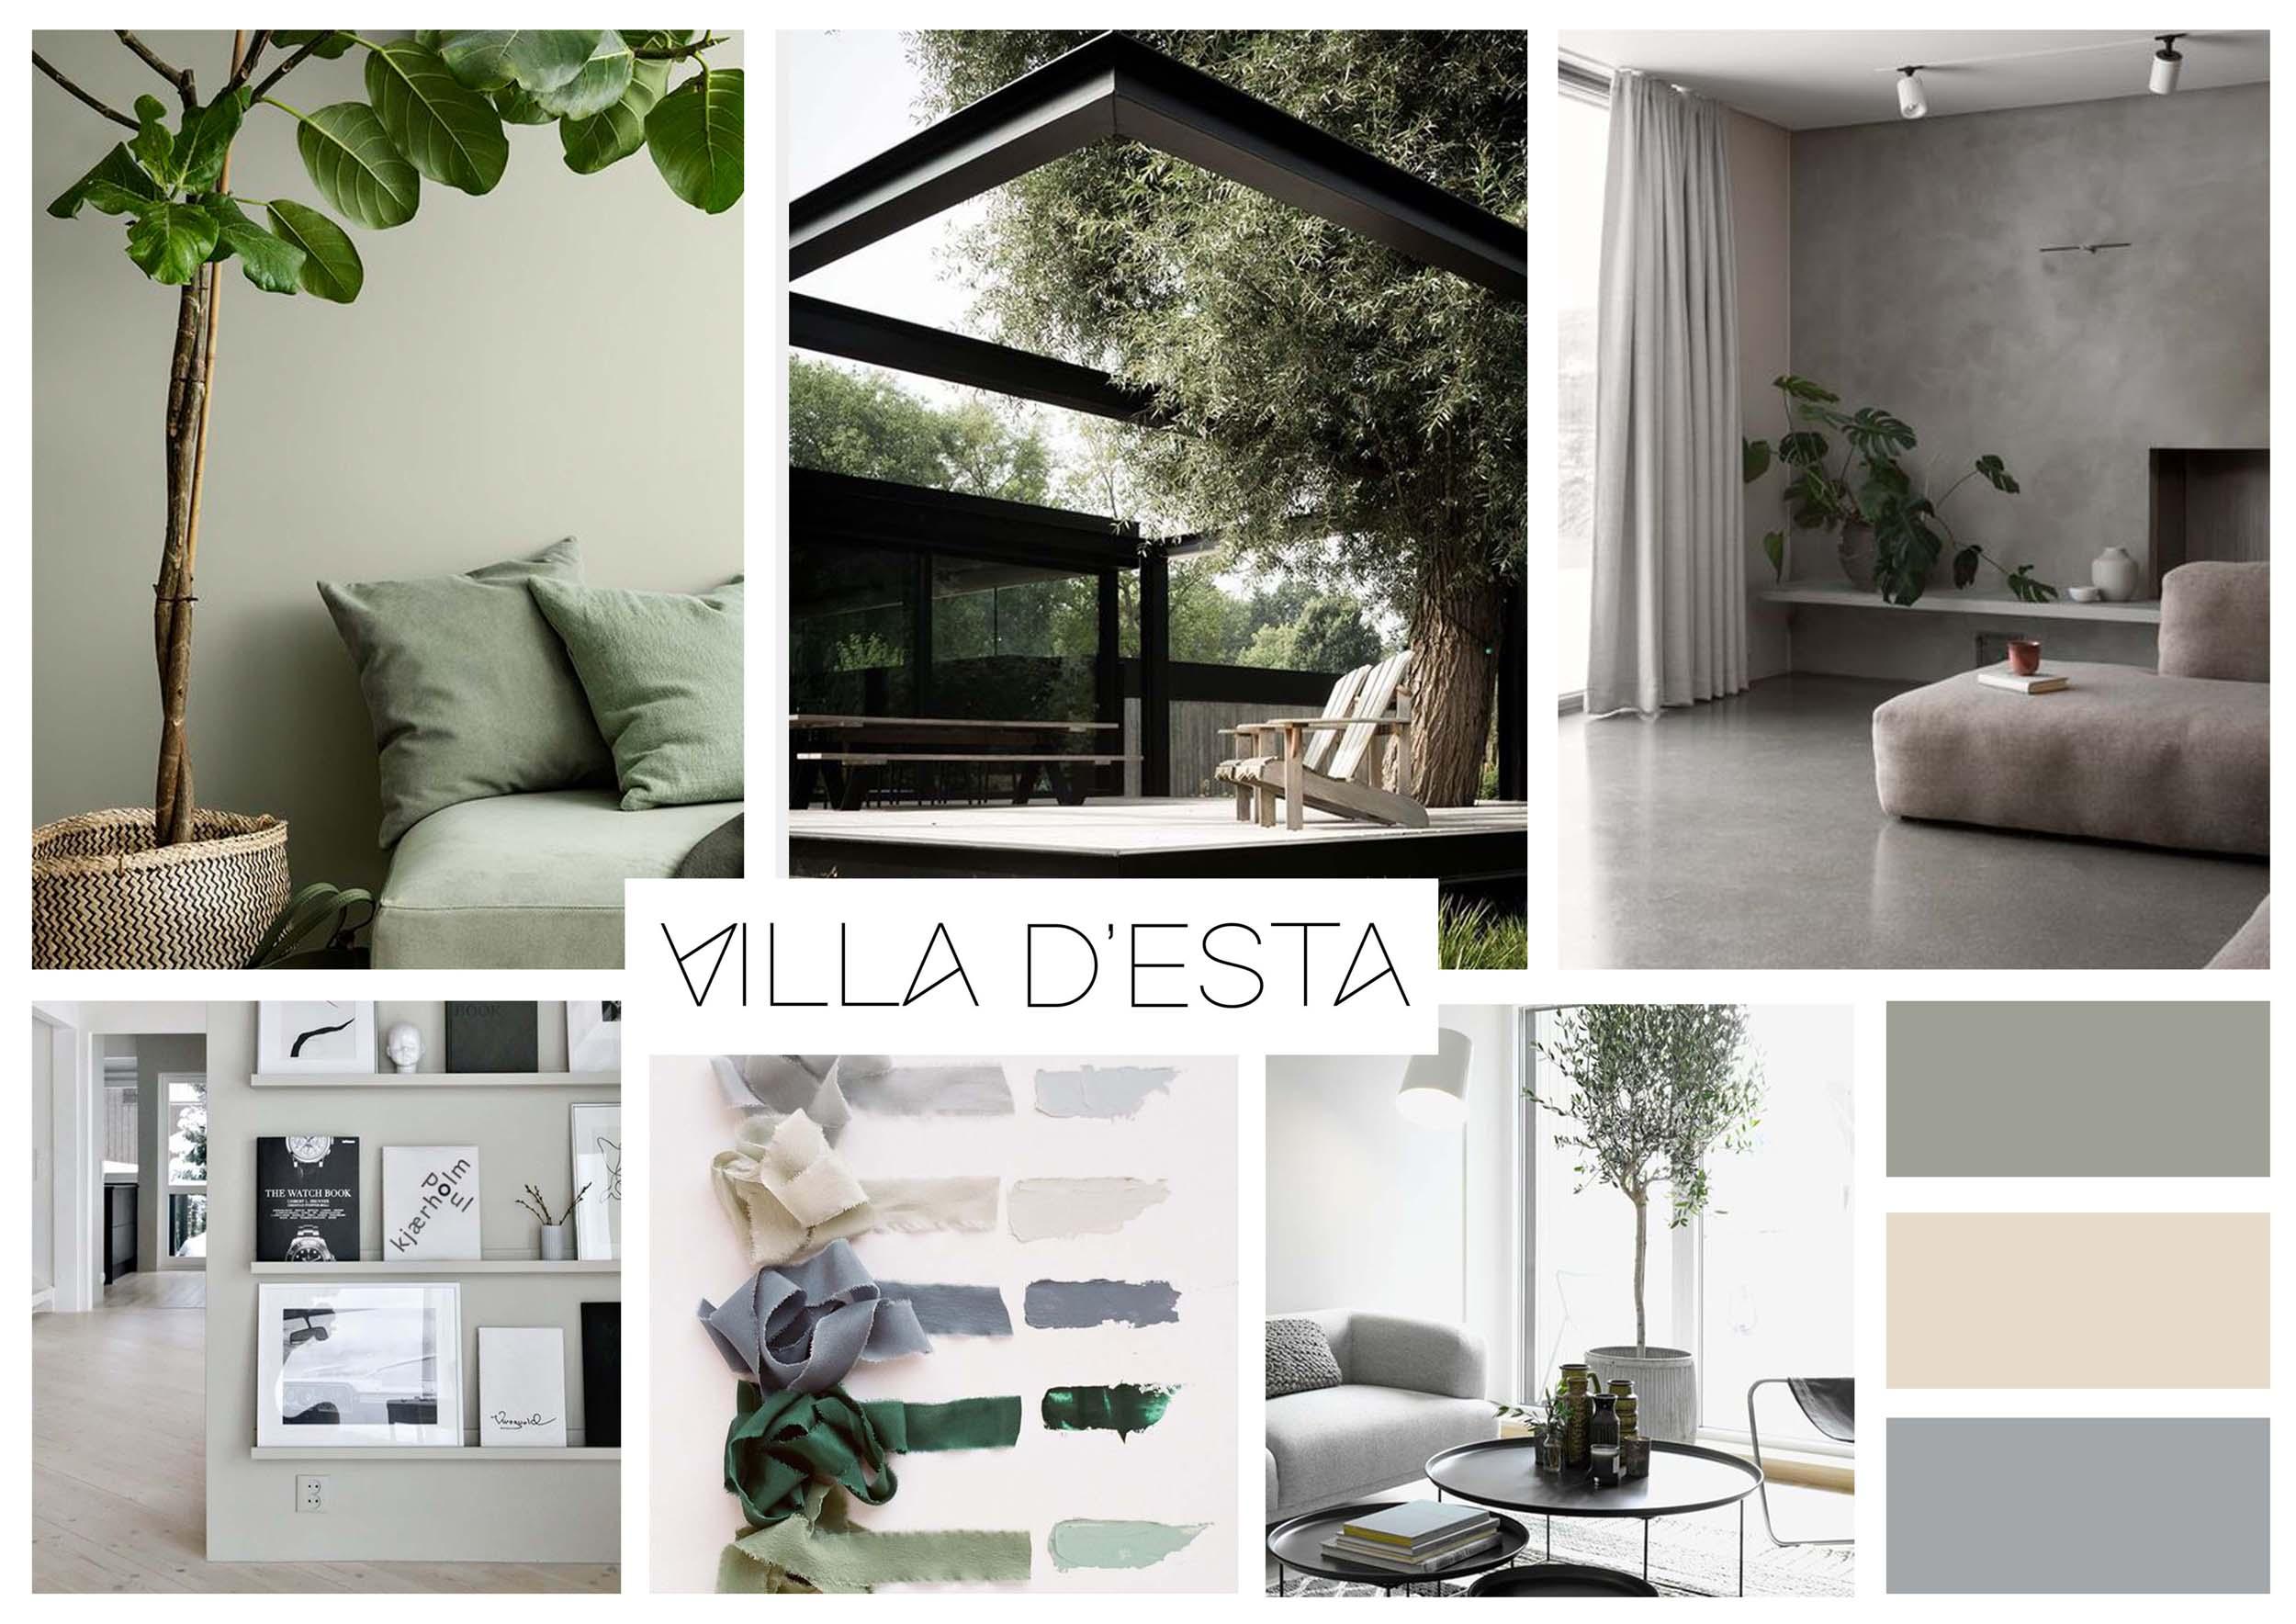 Interieurontwerp villa in jaren 30 stijl villa desta